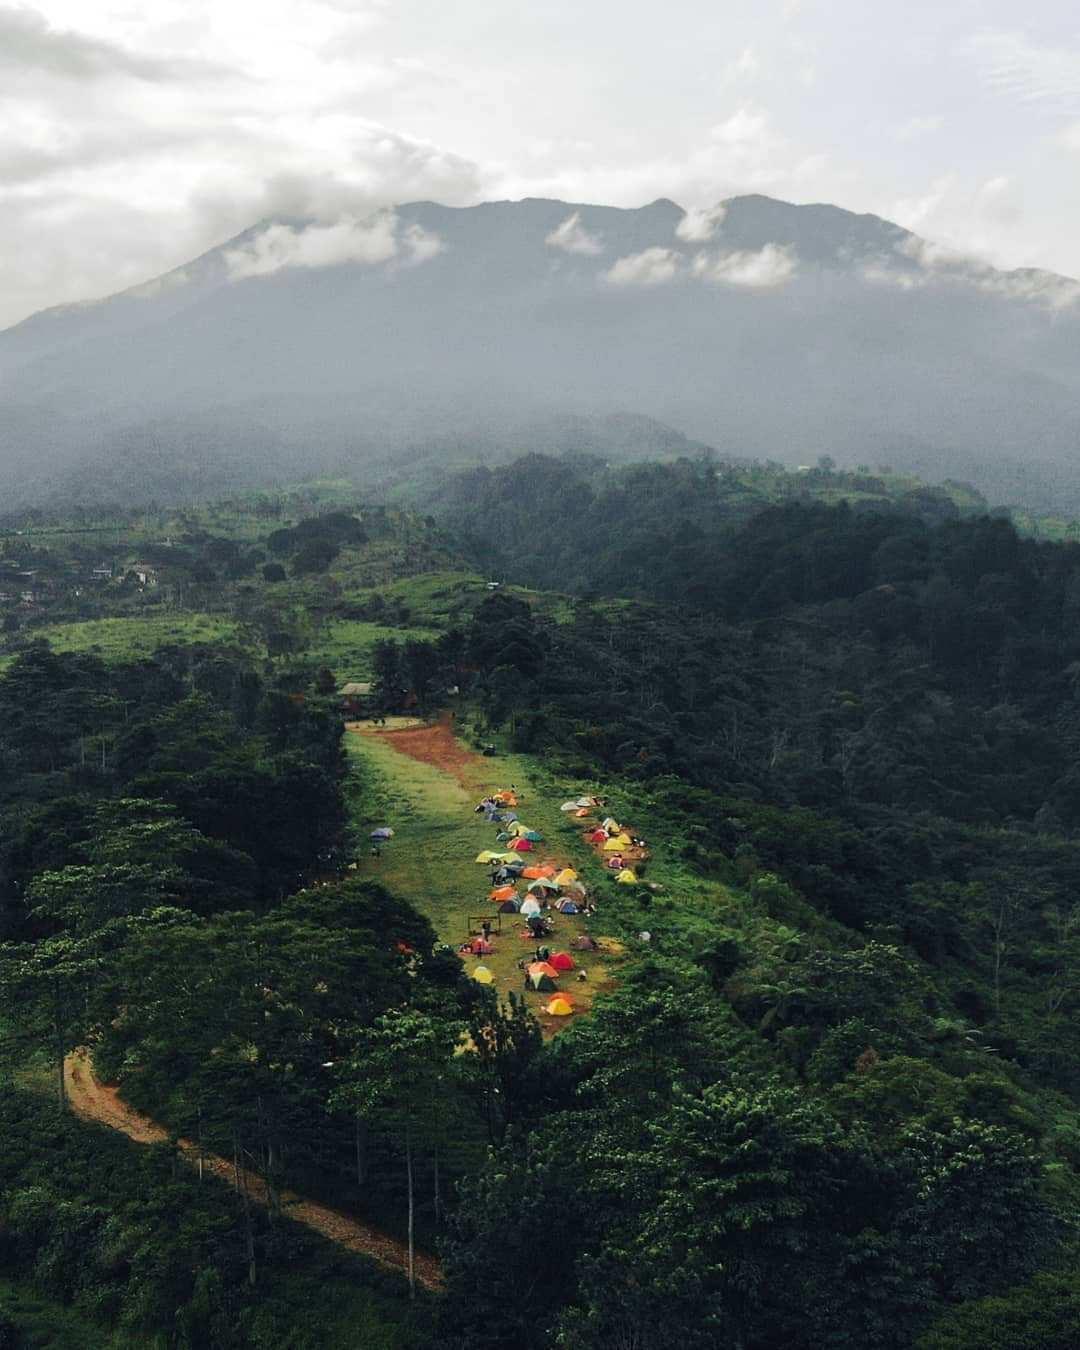 Camping Ground Gayatri Dilihat dari Atas Image From @fadlanai